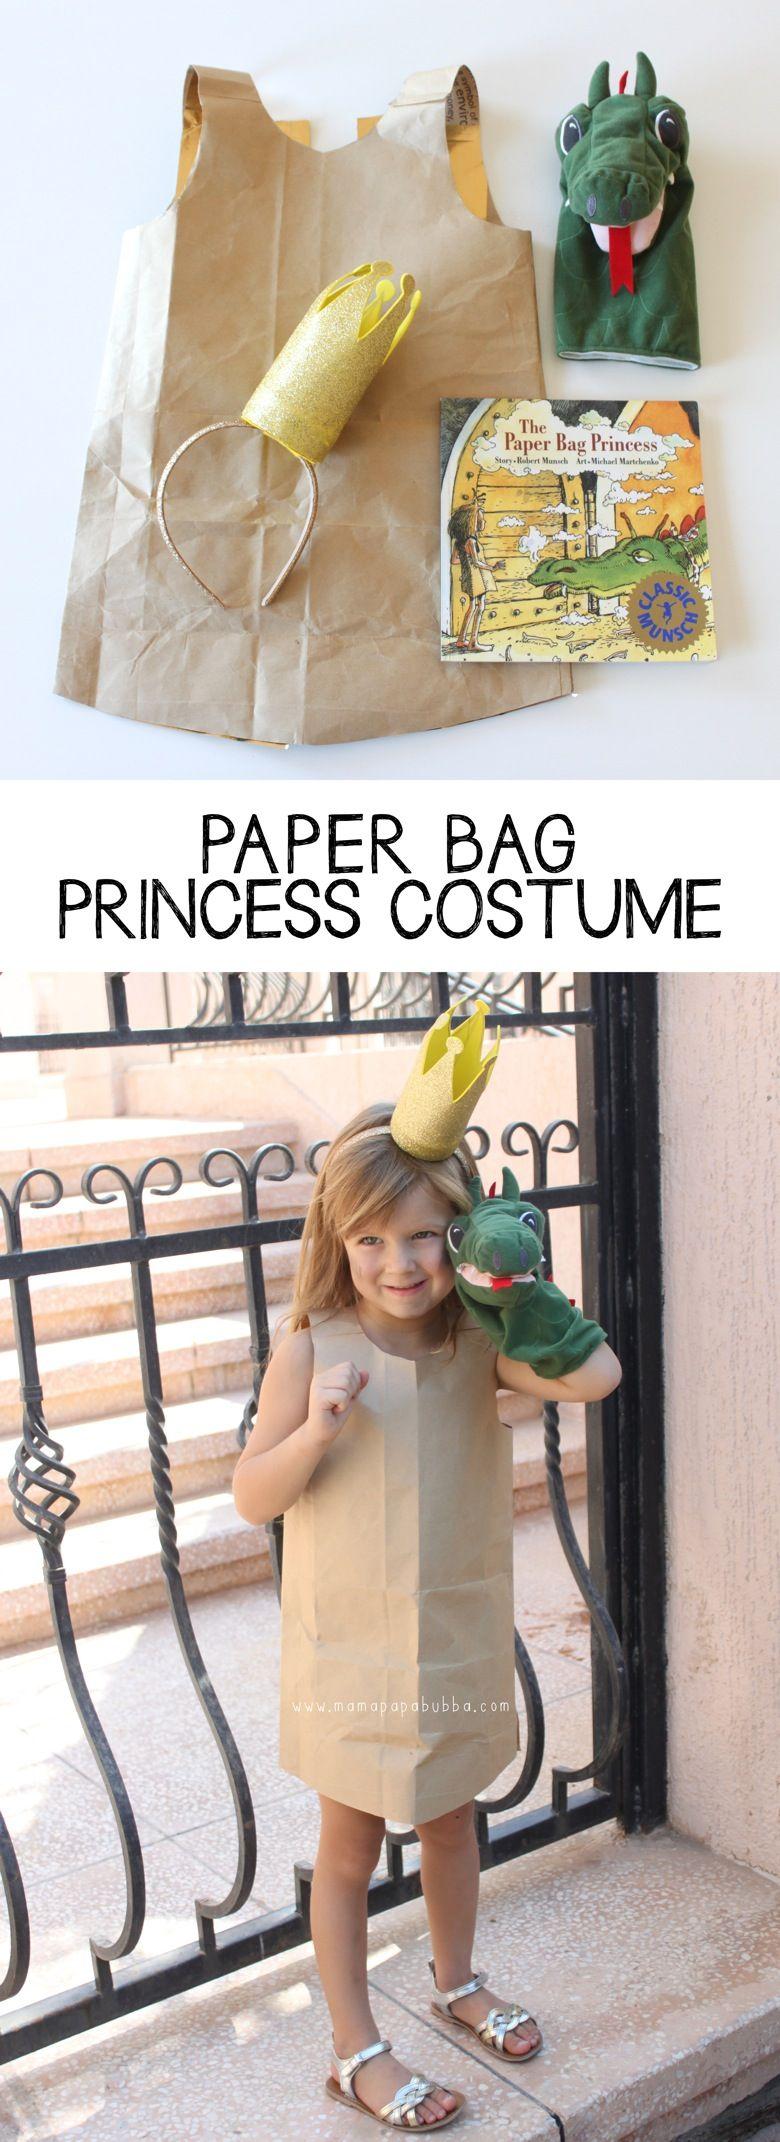 Paper Bag Princess Costume #paperbagprincesscostume